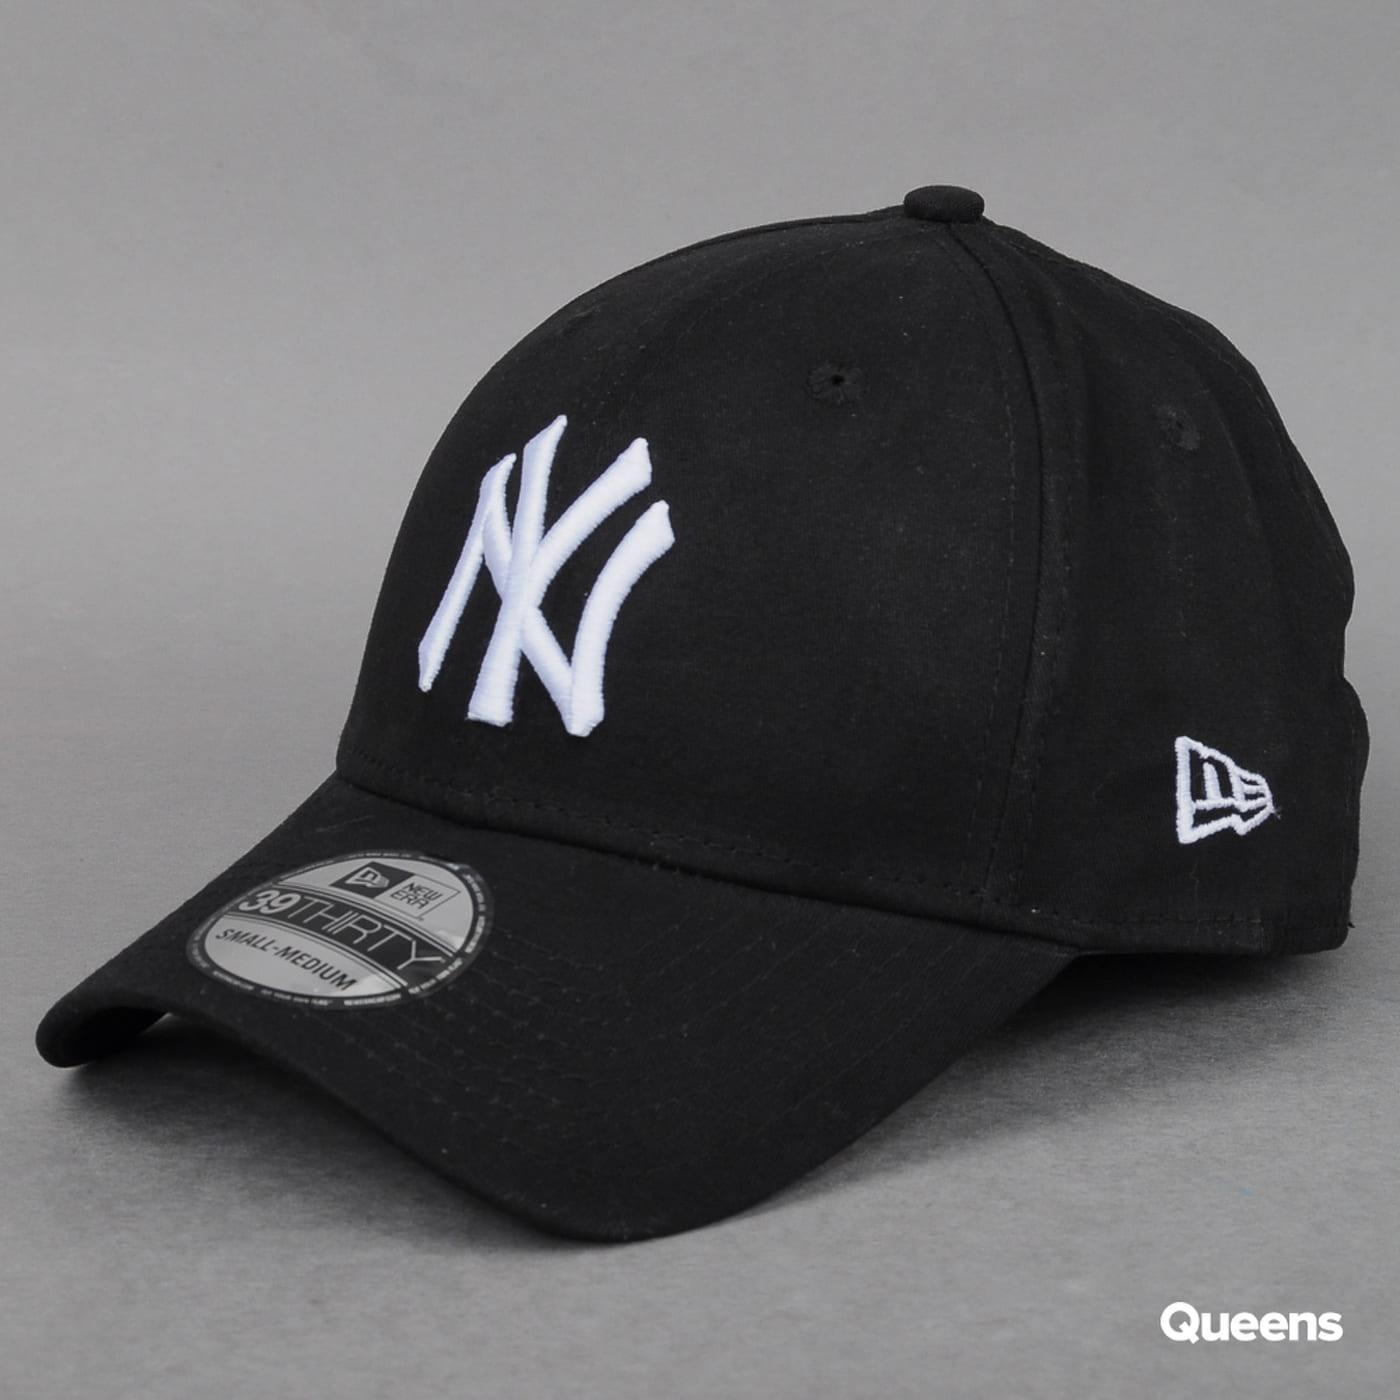 4e80de5fc Šiltovka New Era MLB League Basic NY čierna / biela (10015802) – Queens 💚